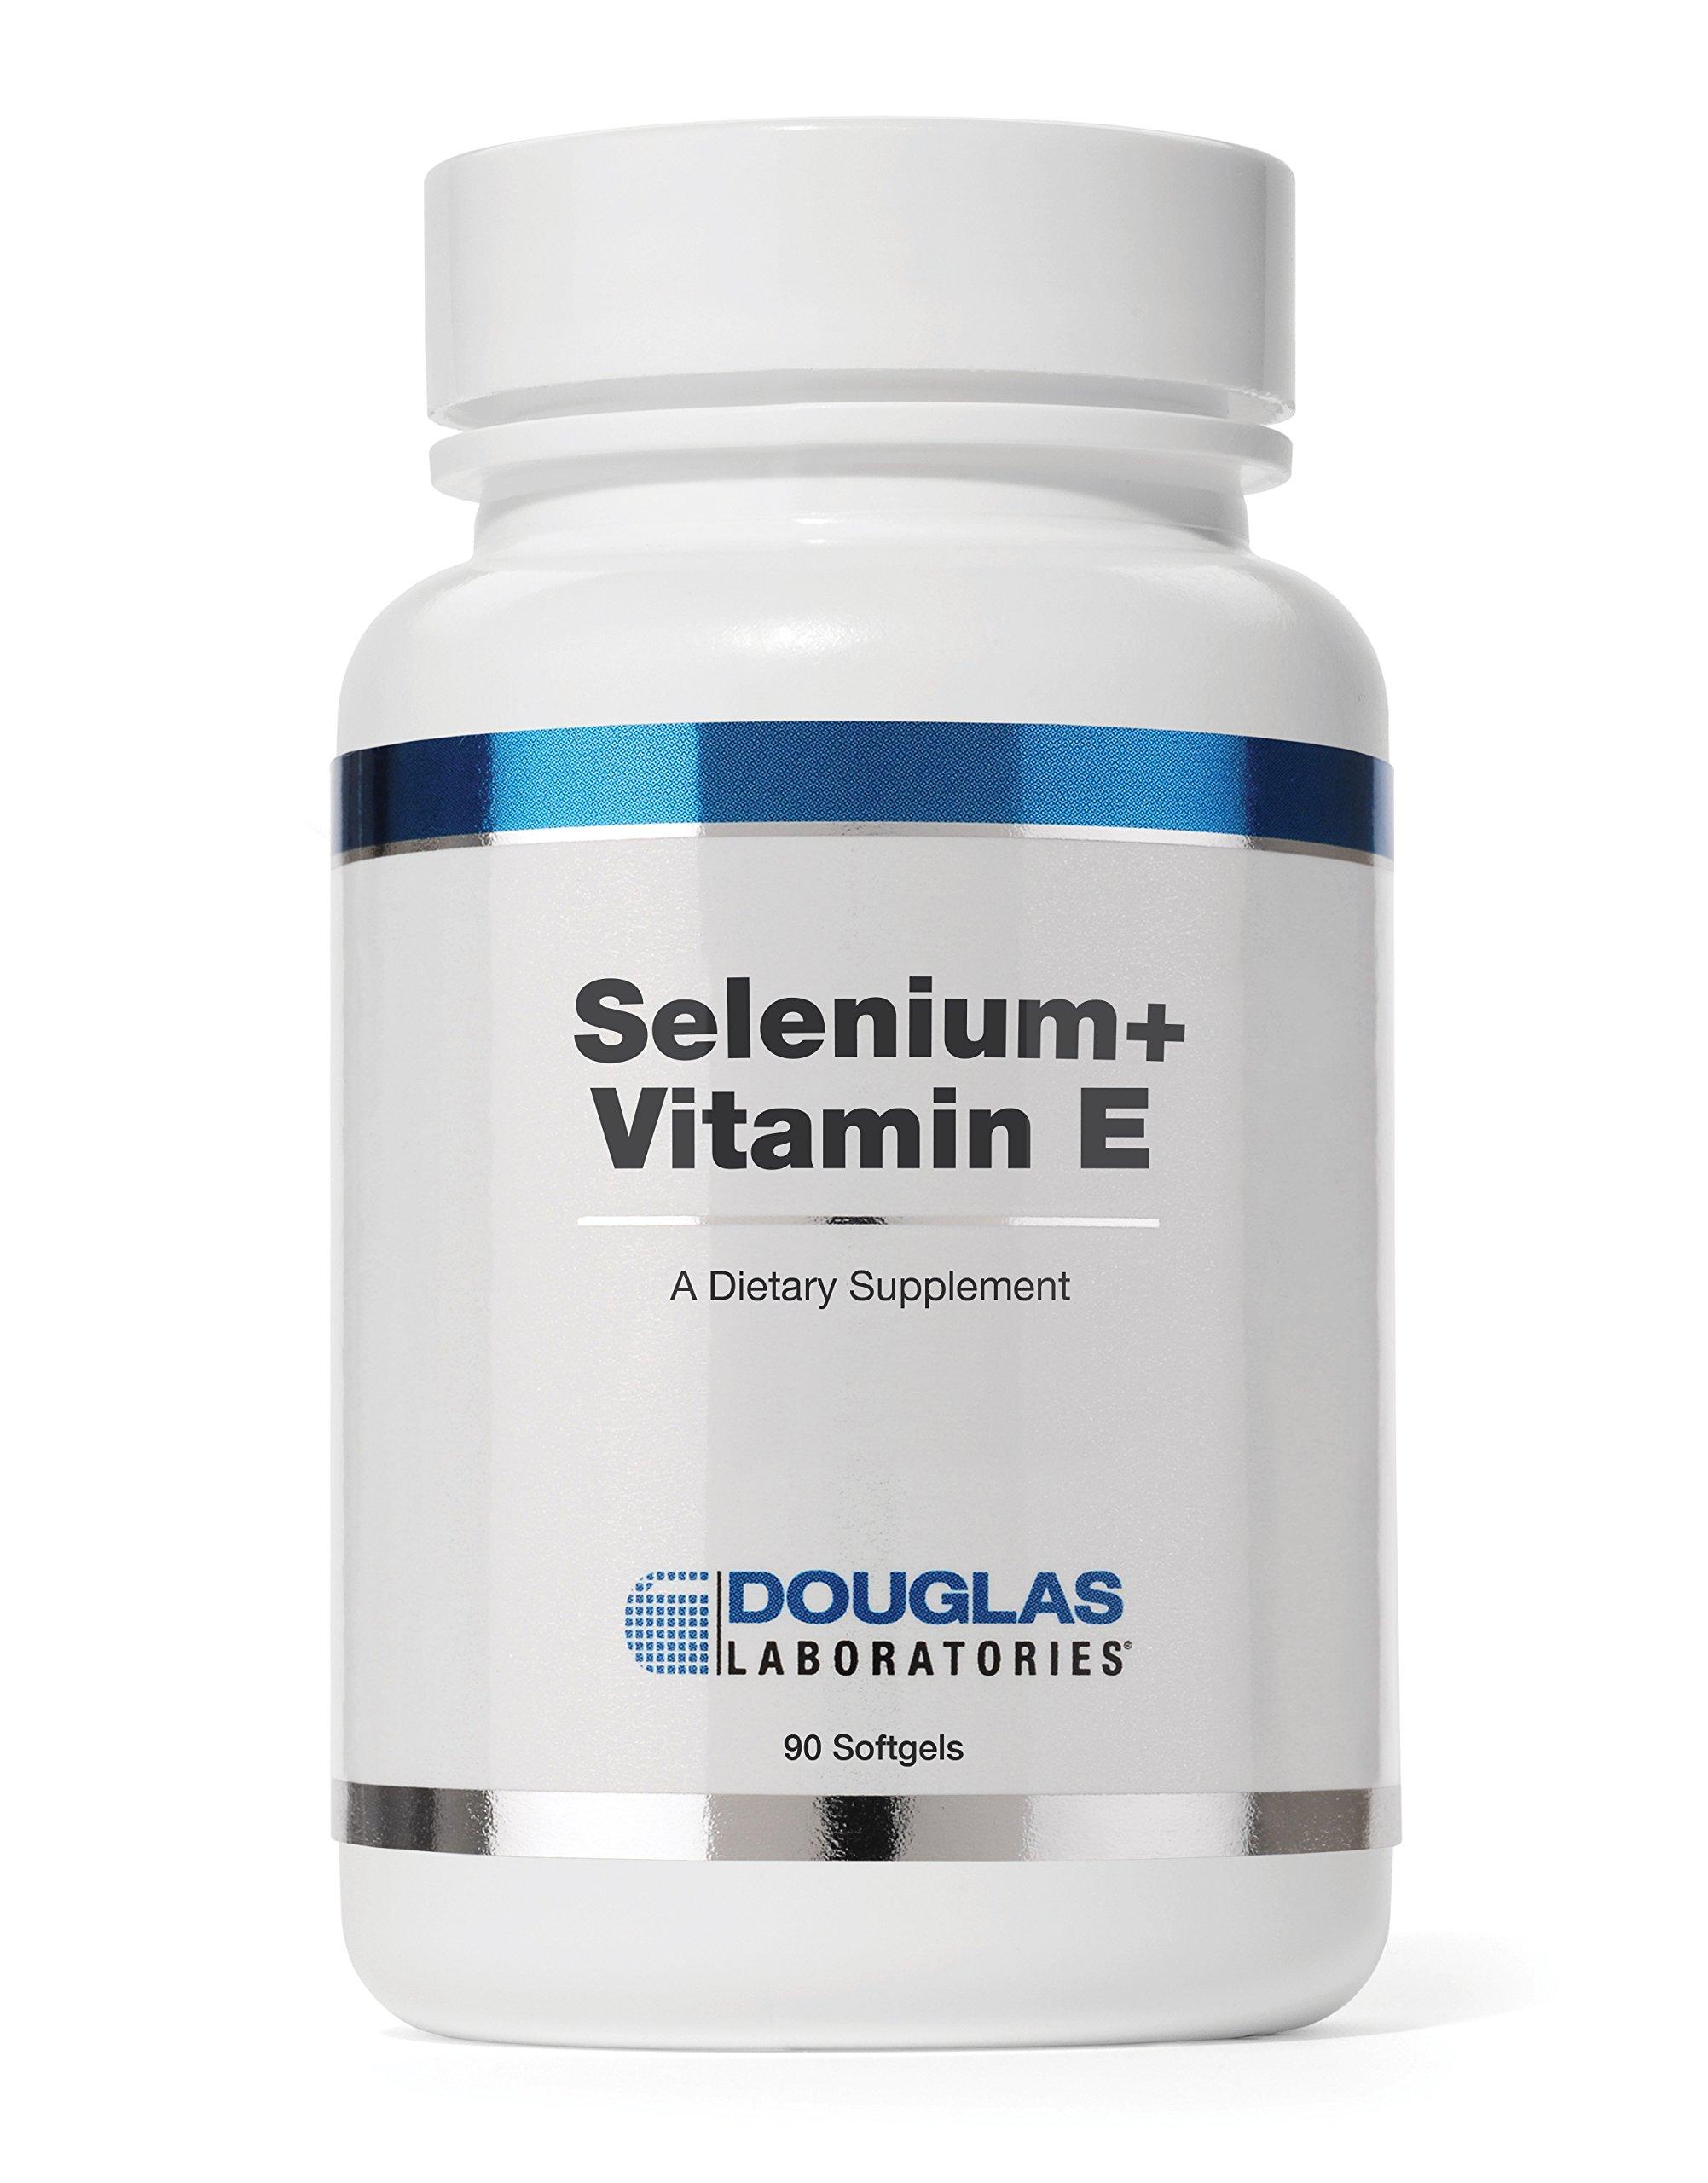 Douglas Laboratories - Selenium + Vitamin E - 400 I.U. of Natural Form of Vitamin E and 50 mcg. of Selenium - 90 Softgels